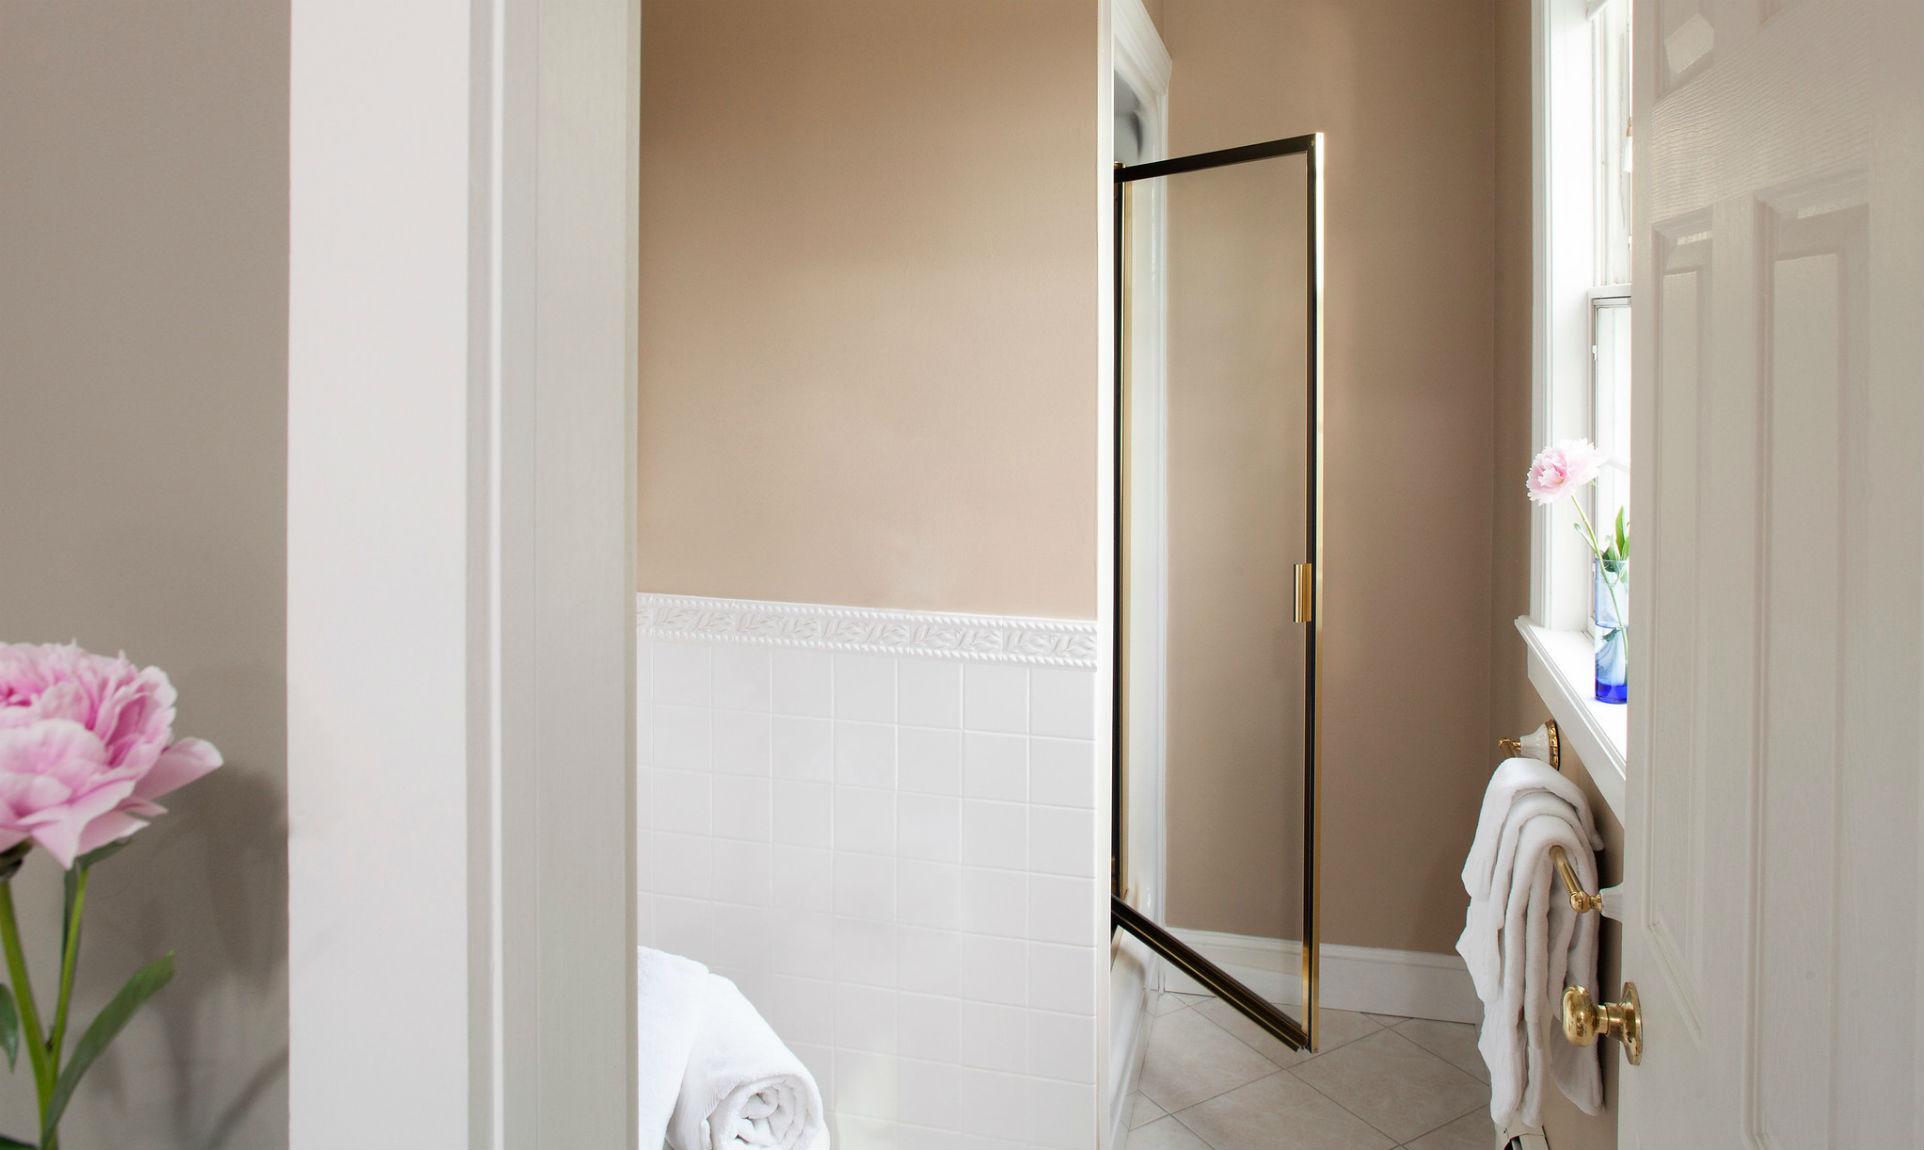 Open shower door at the end of the bathroom